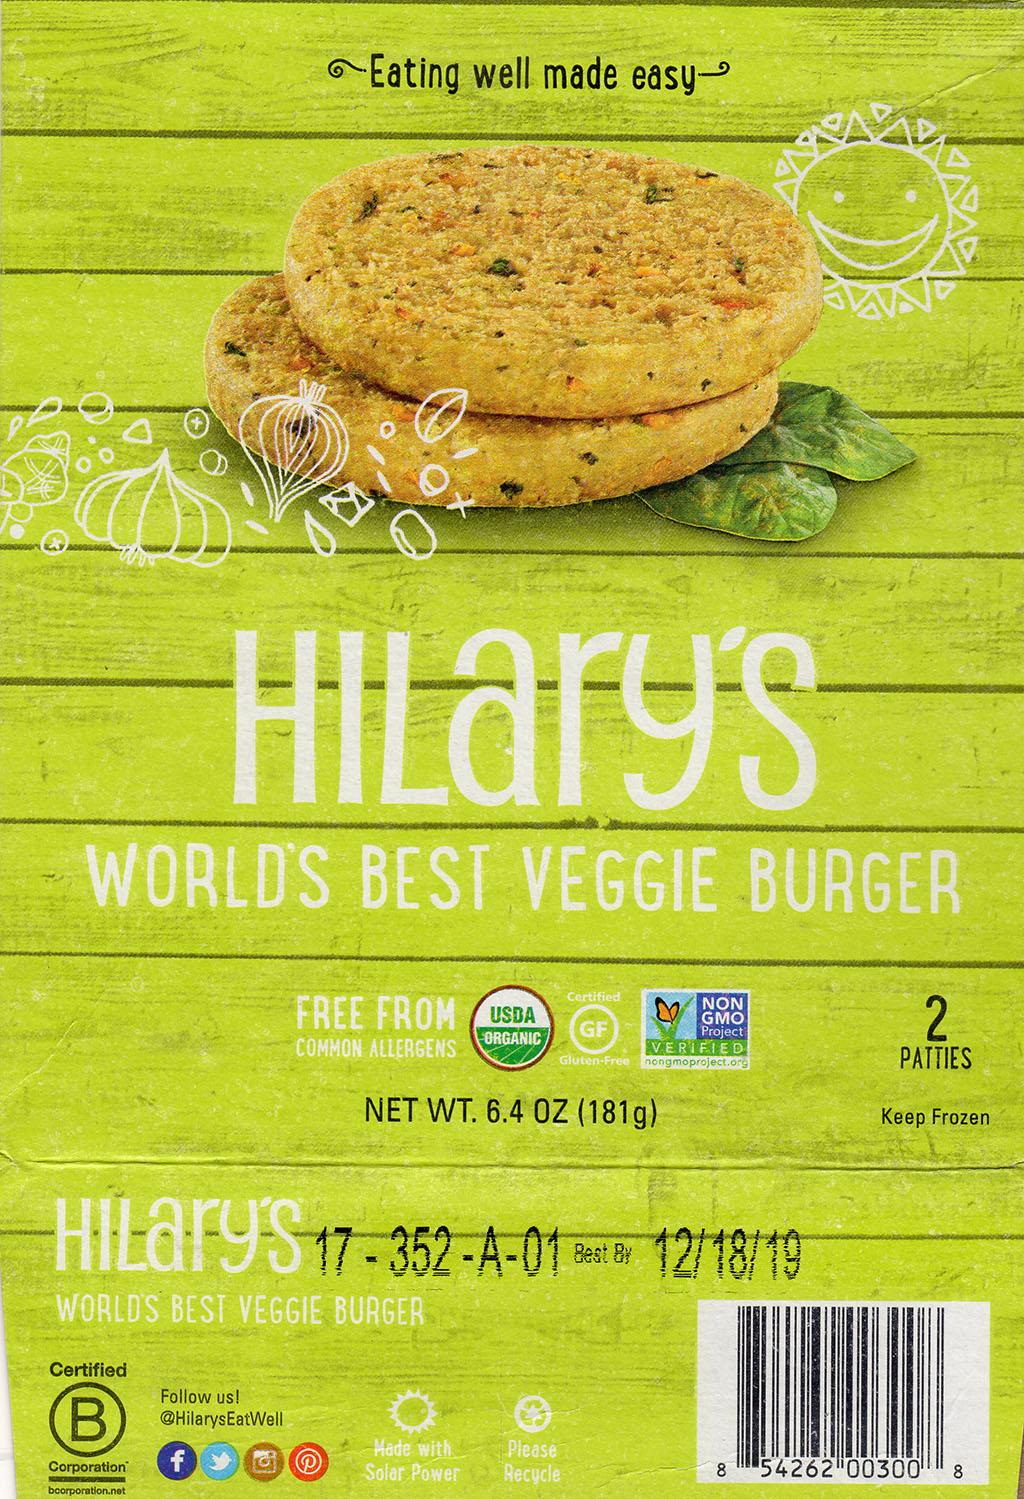 Hillary's Worlds Best Veggie Burger package front